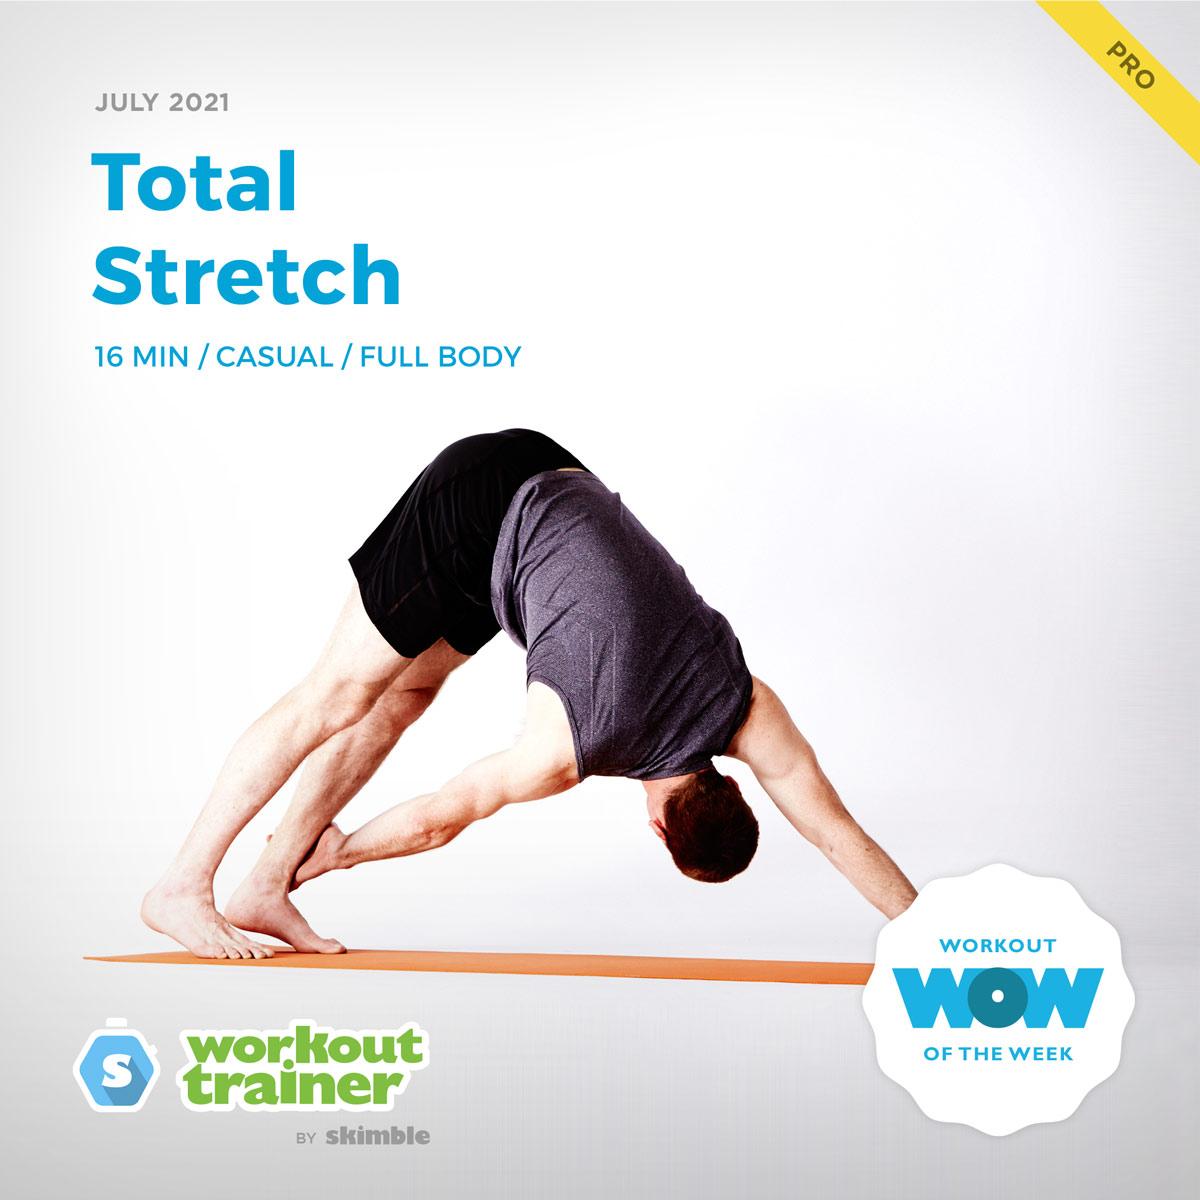 Male Yoga Instructor doing Left Twisting Down Dog on a yoga mat